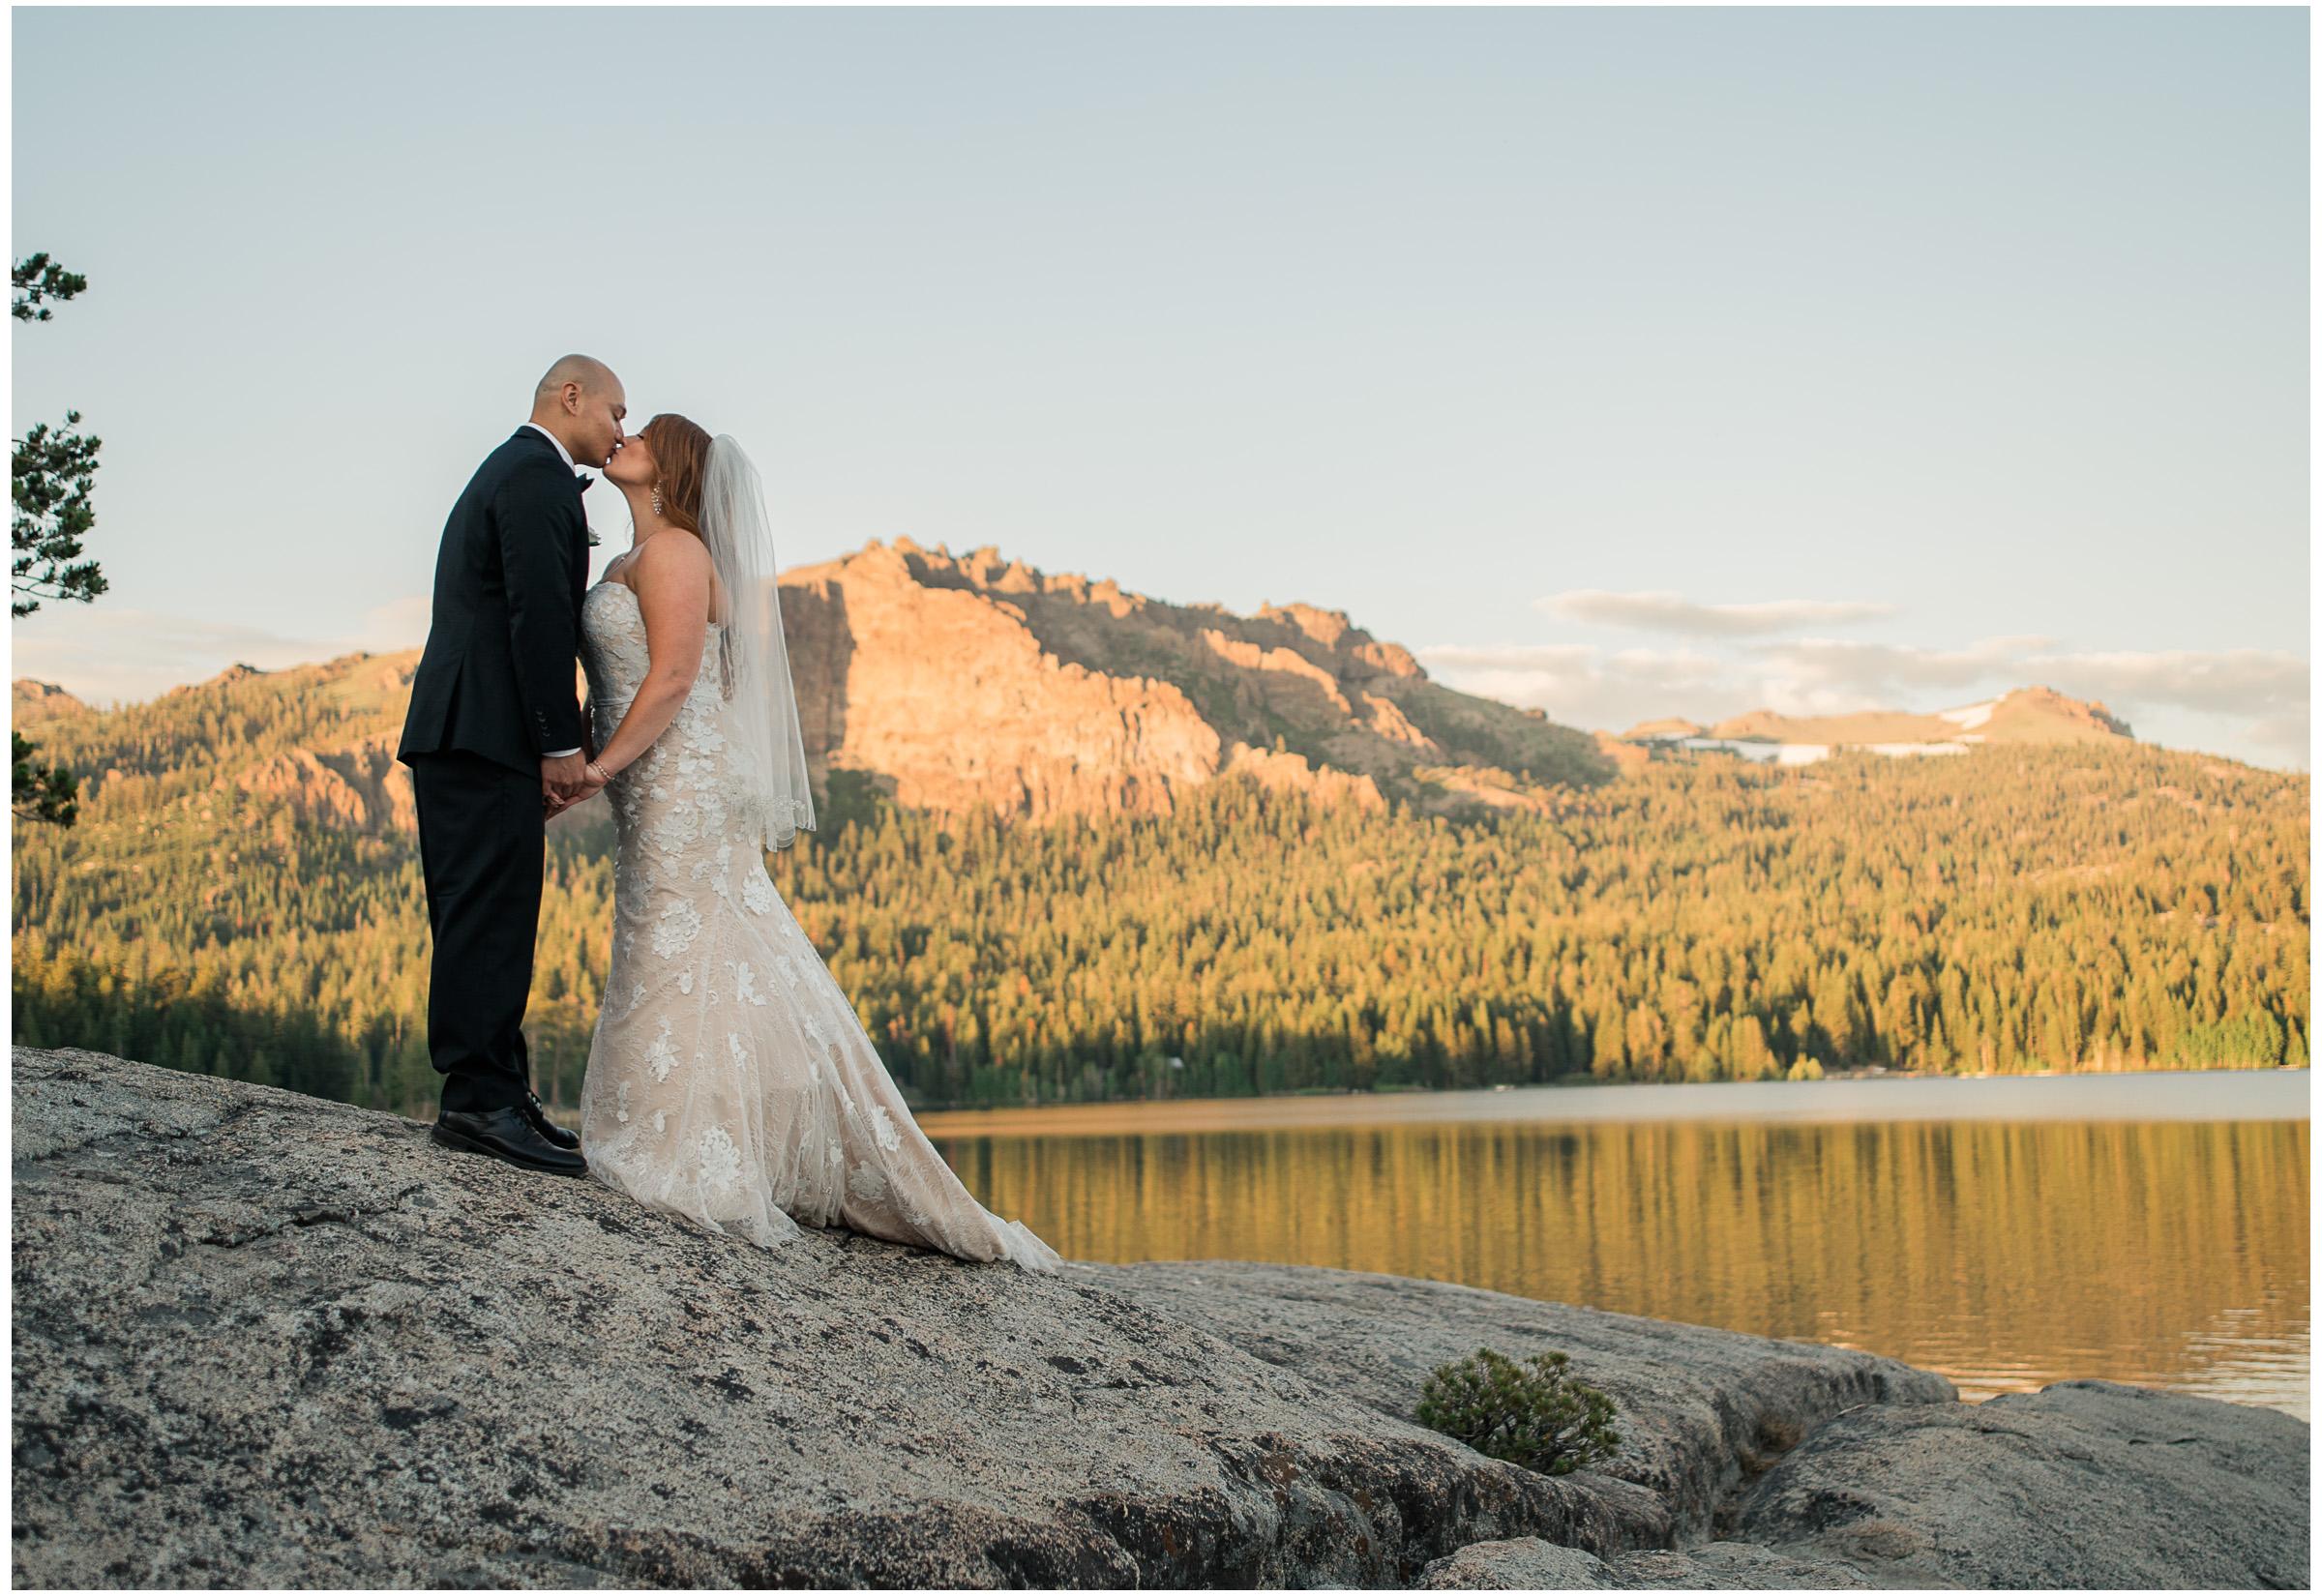 Clarksburg Wedding - Sacramento Photographer - Bogle Winery - Justin Wilcox Photography - 13.jpg